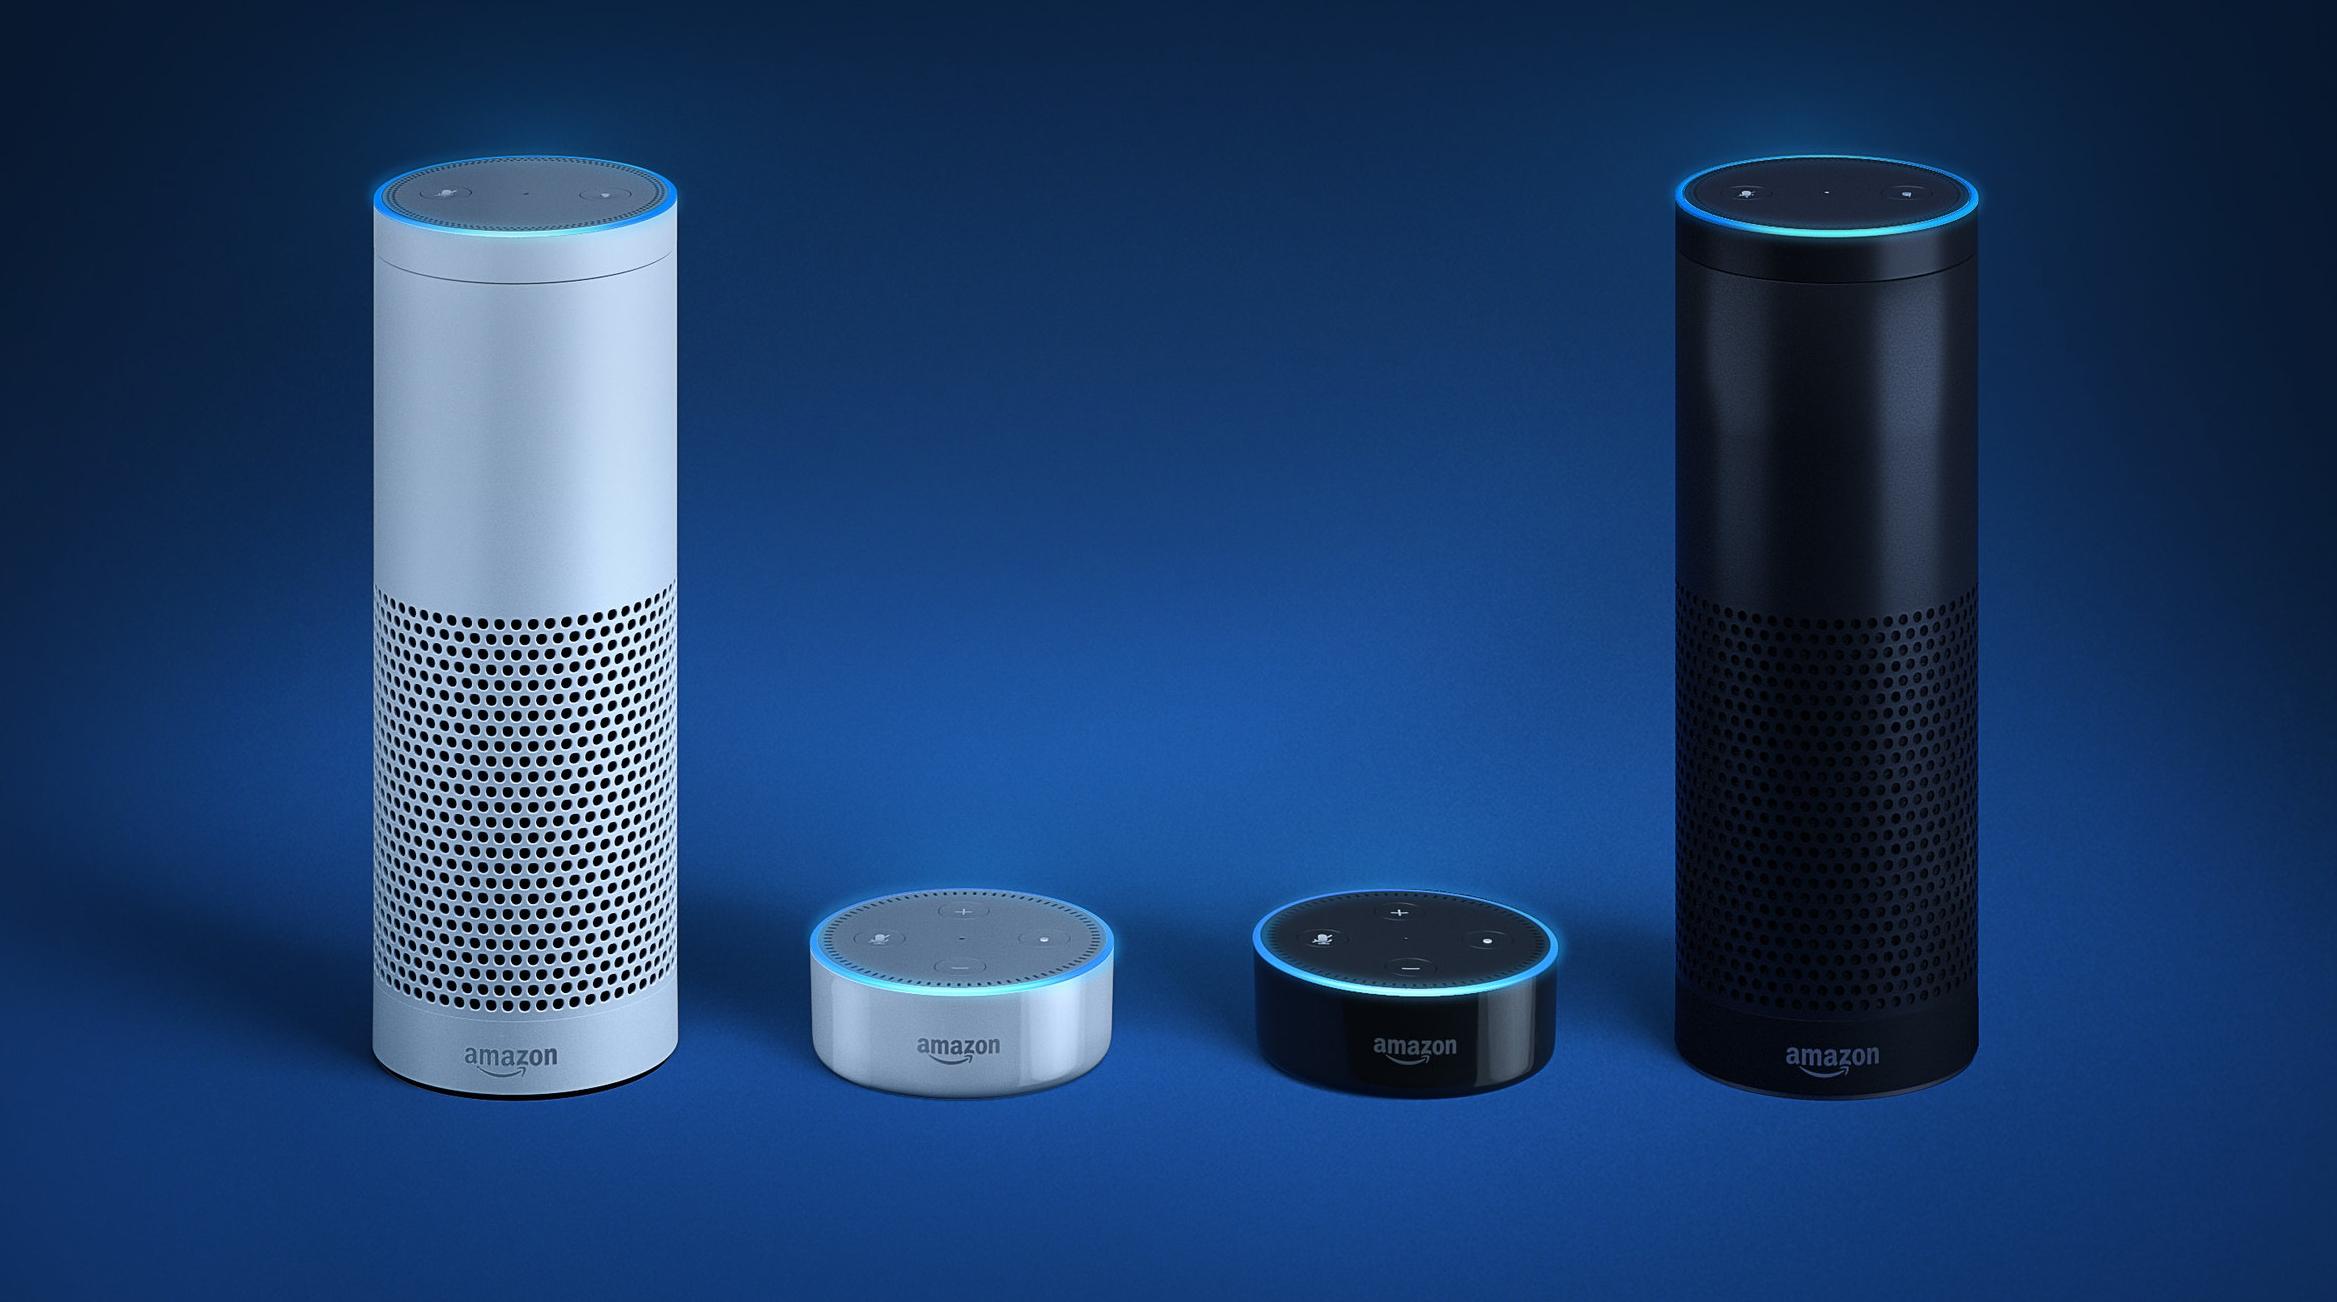 Alexa products